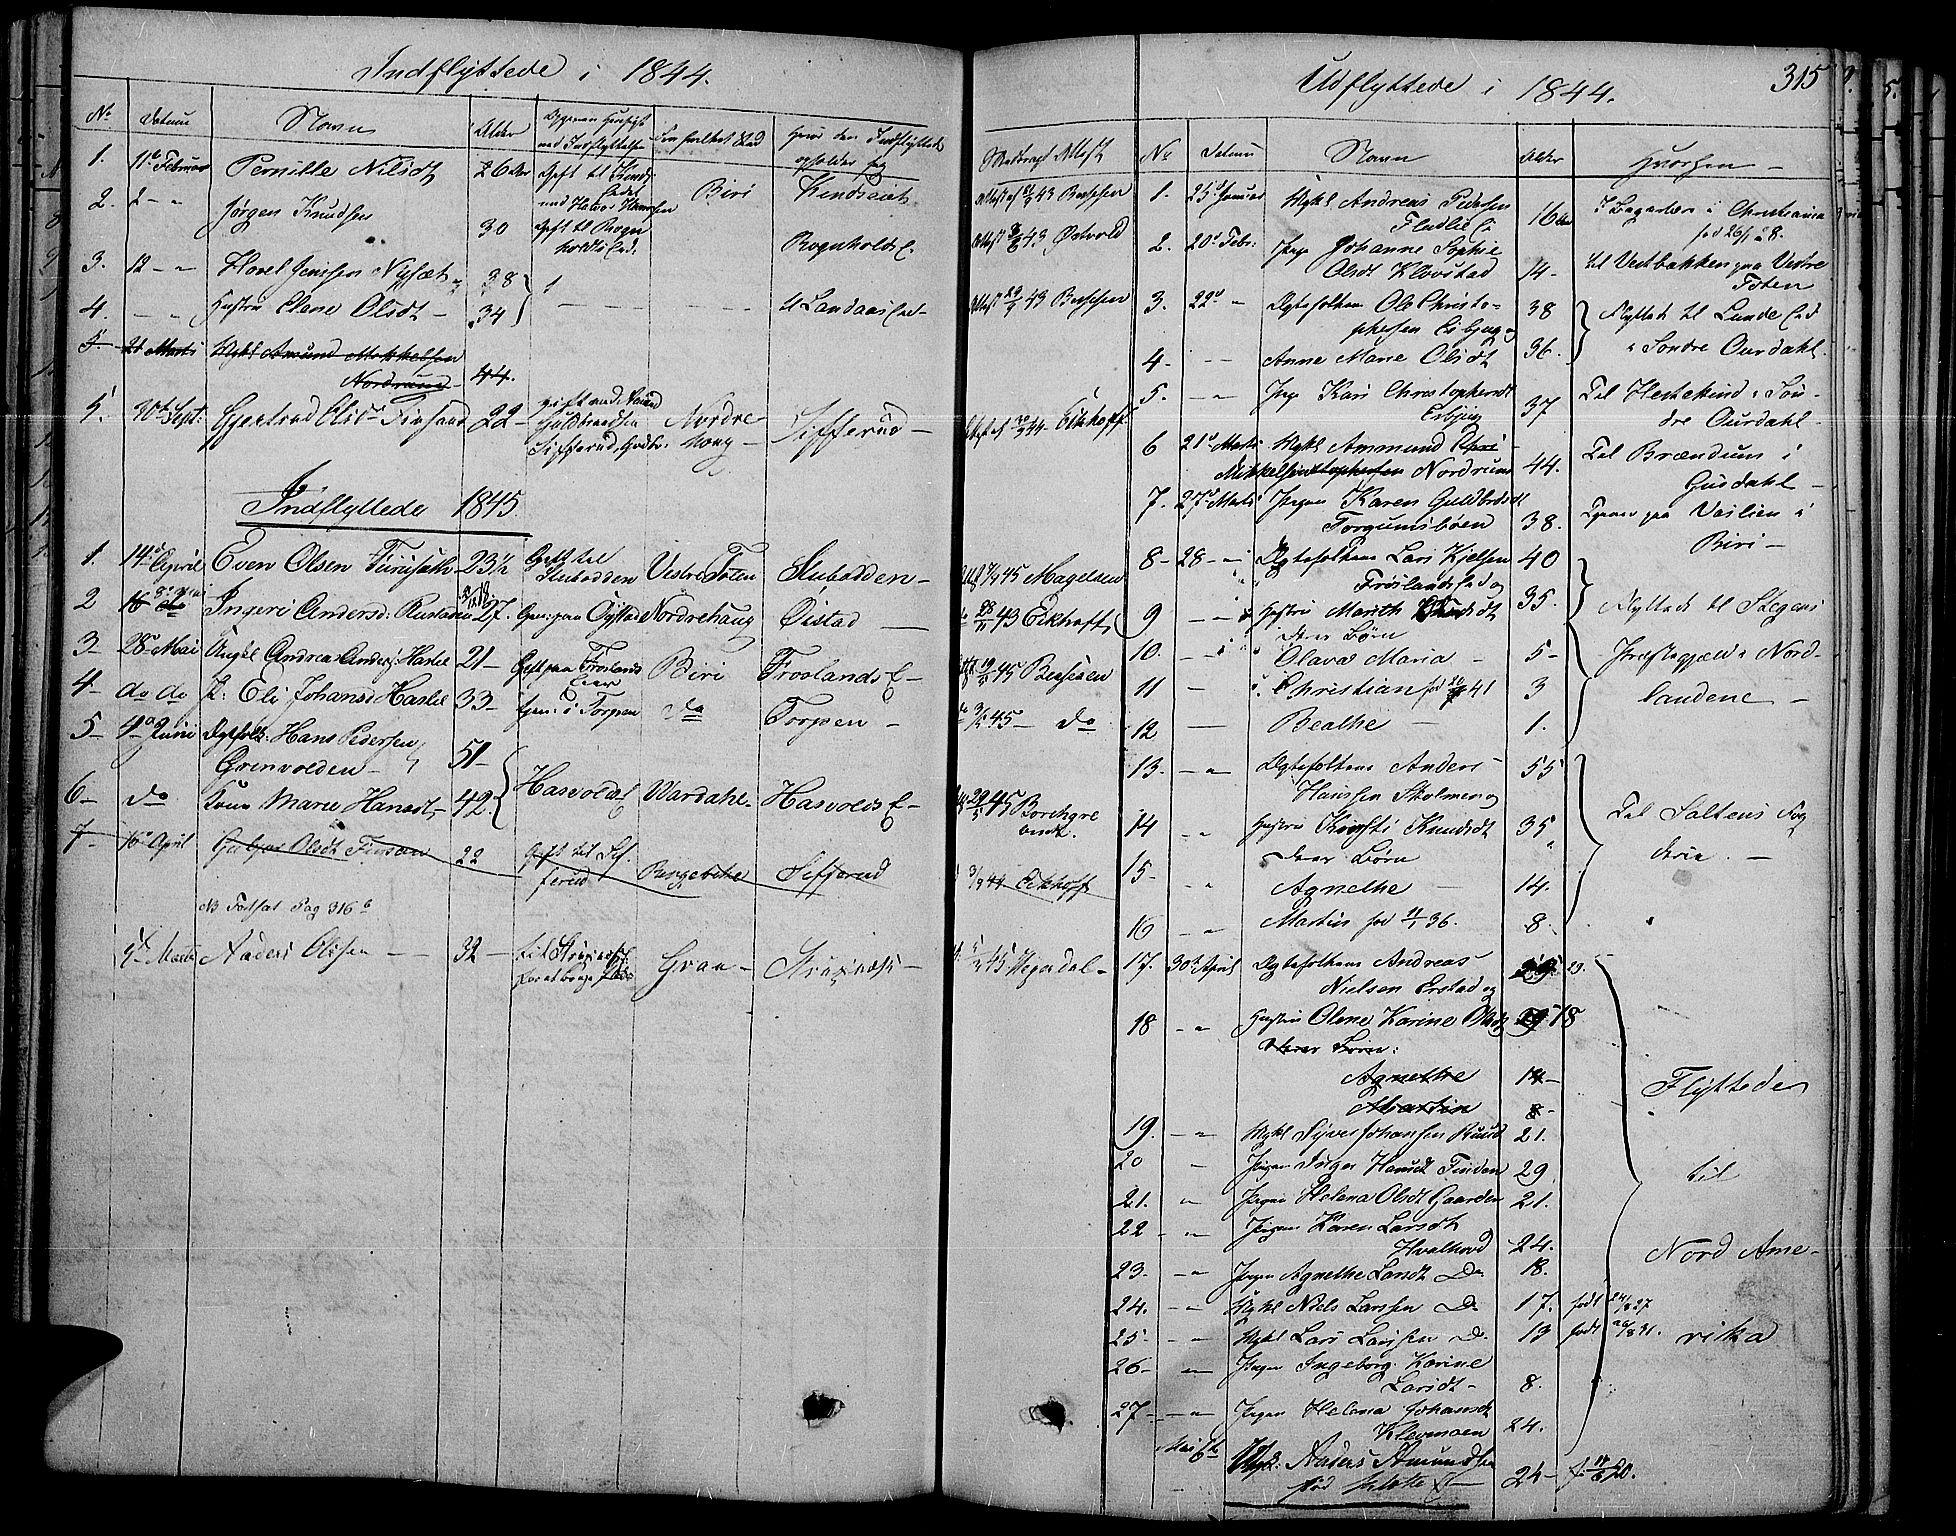 SAH, Land prestekontor, Ministerialbok nr. 8, 1830-1846, s. 315